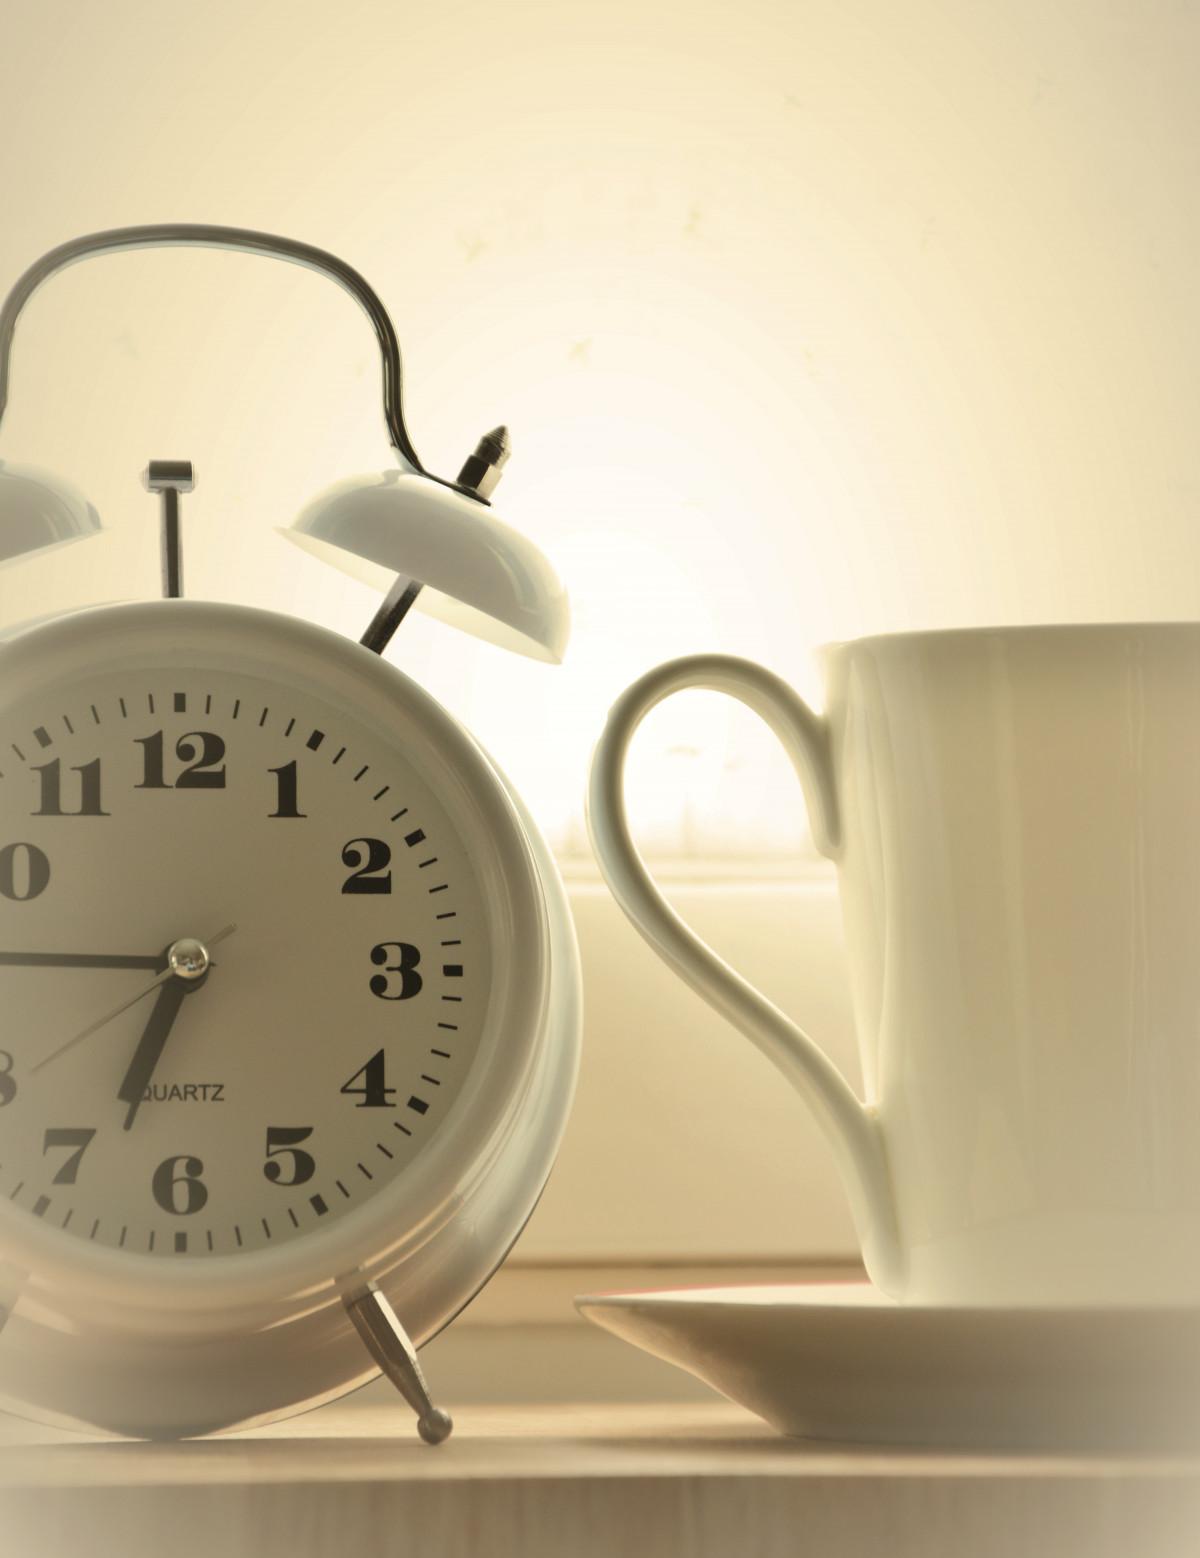 Free Images Alarm Clock Ceramic Lighting Coffee Cup